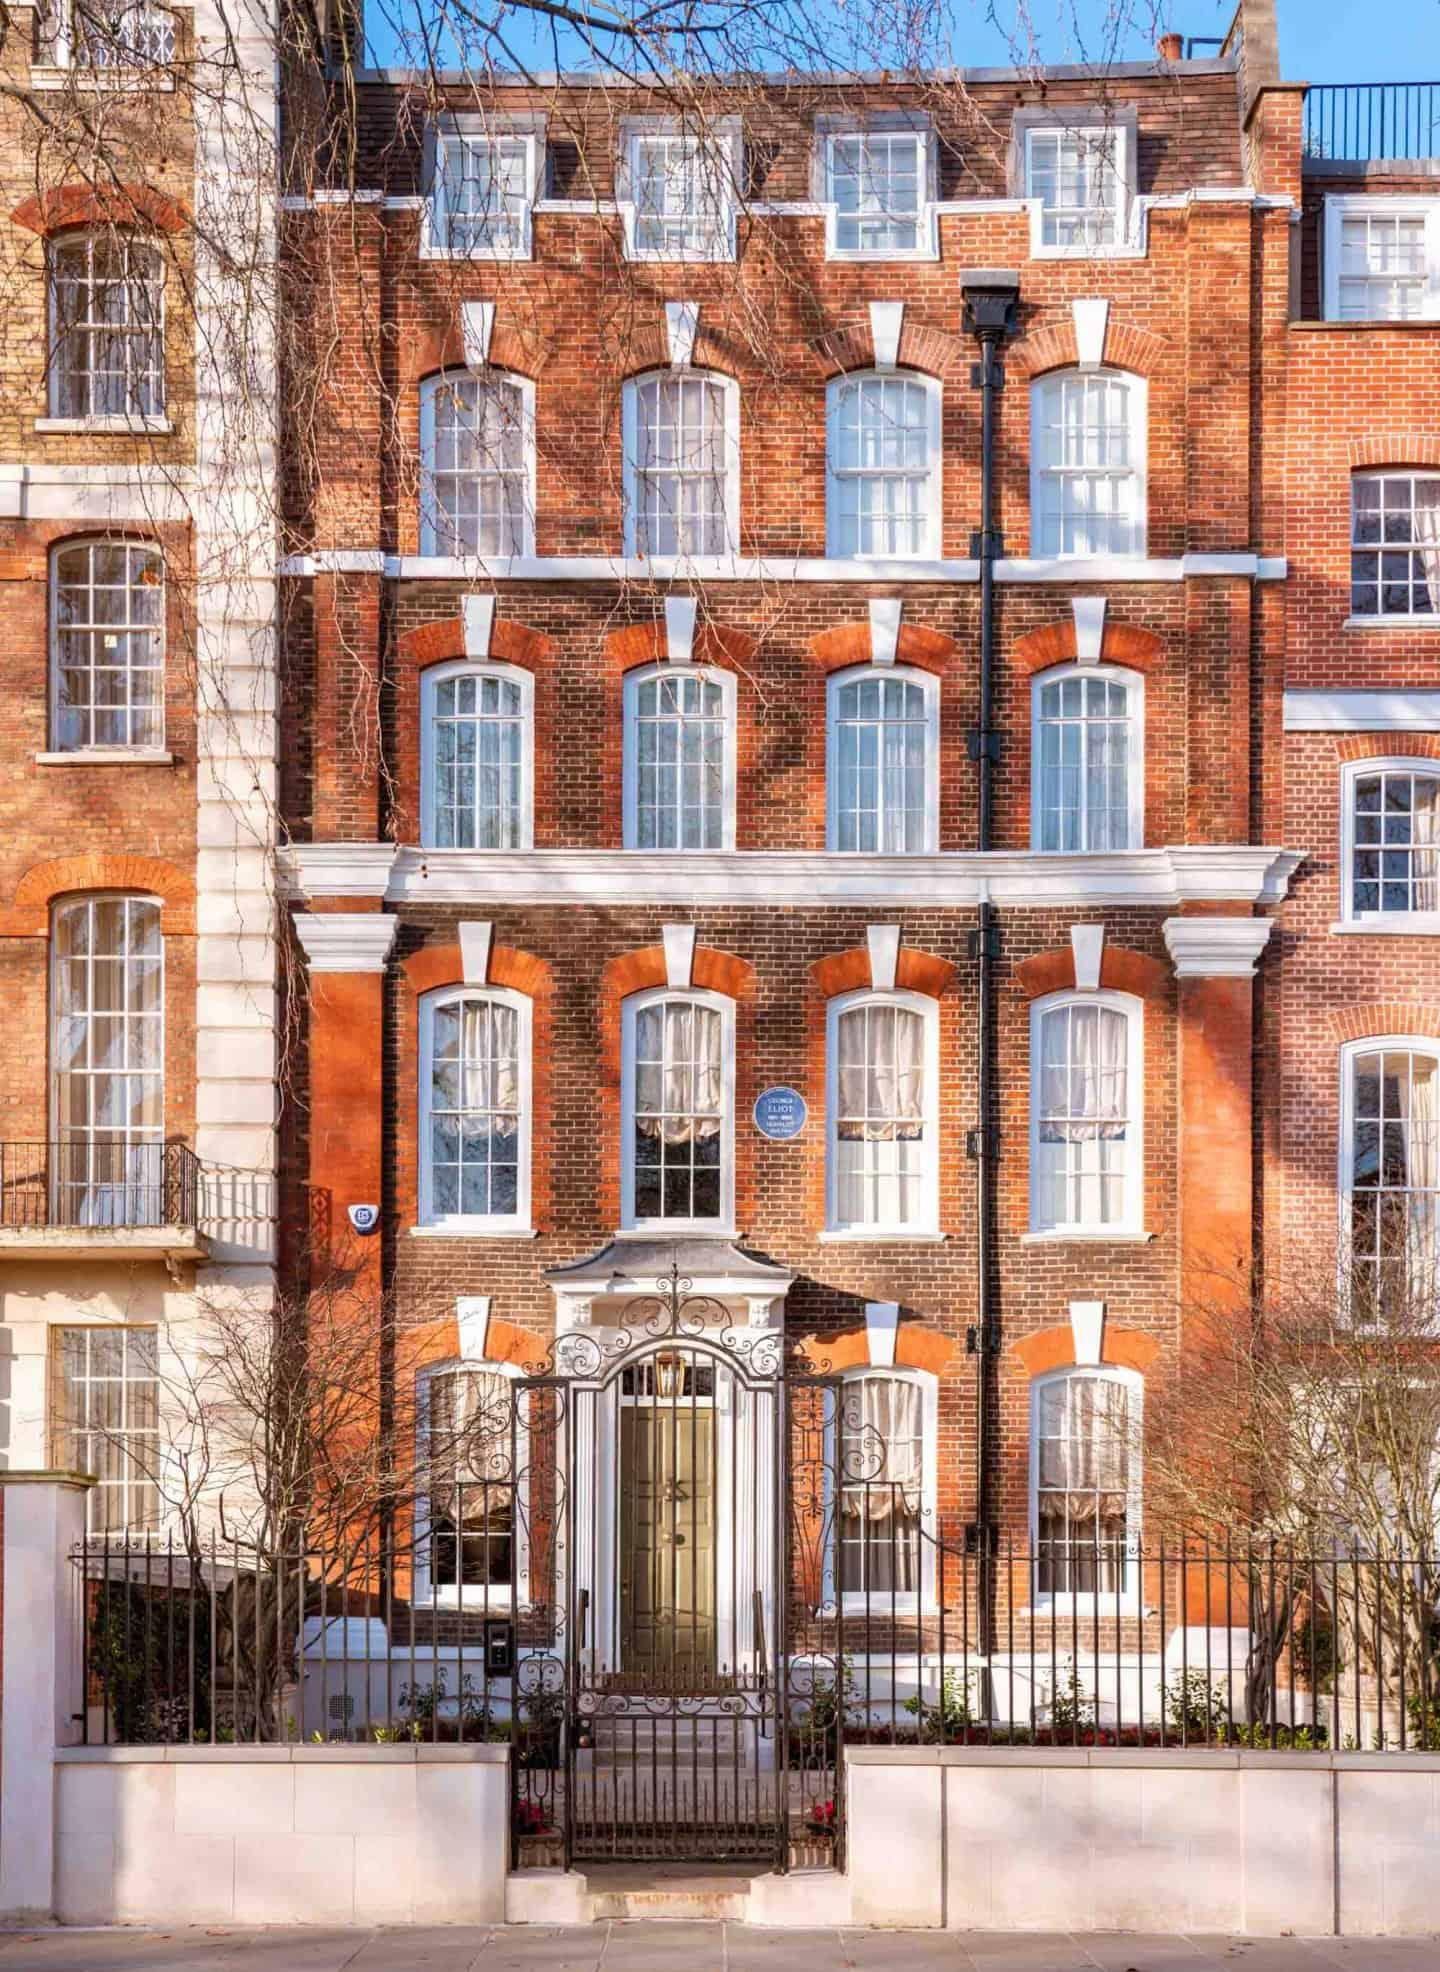 Cheyne Walk town house on famous London street